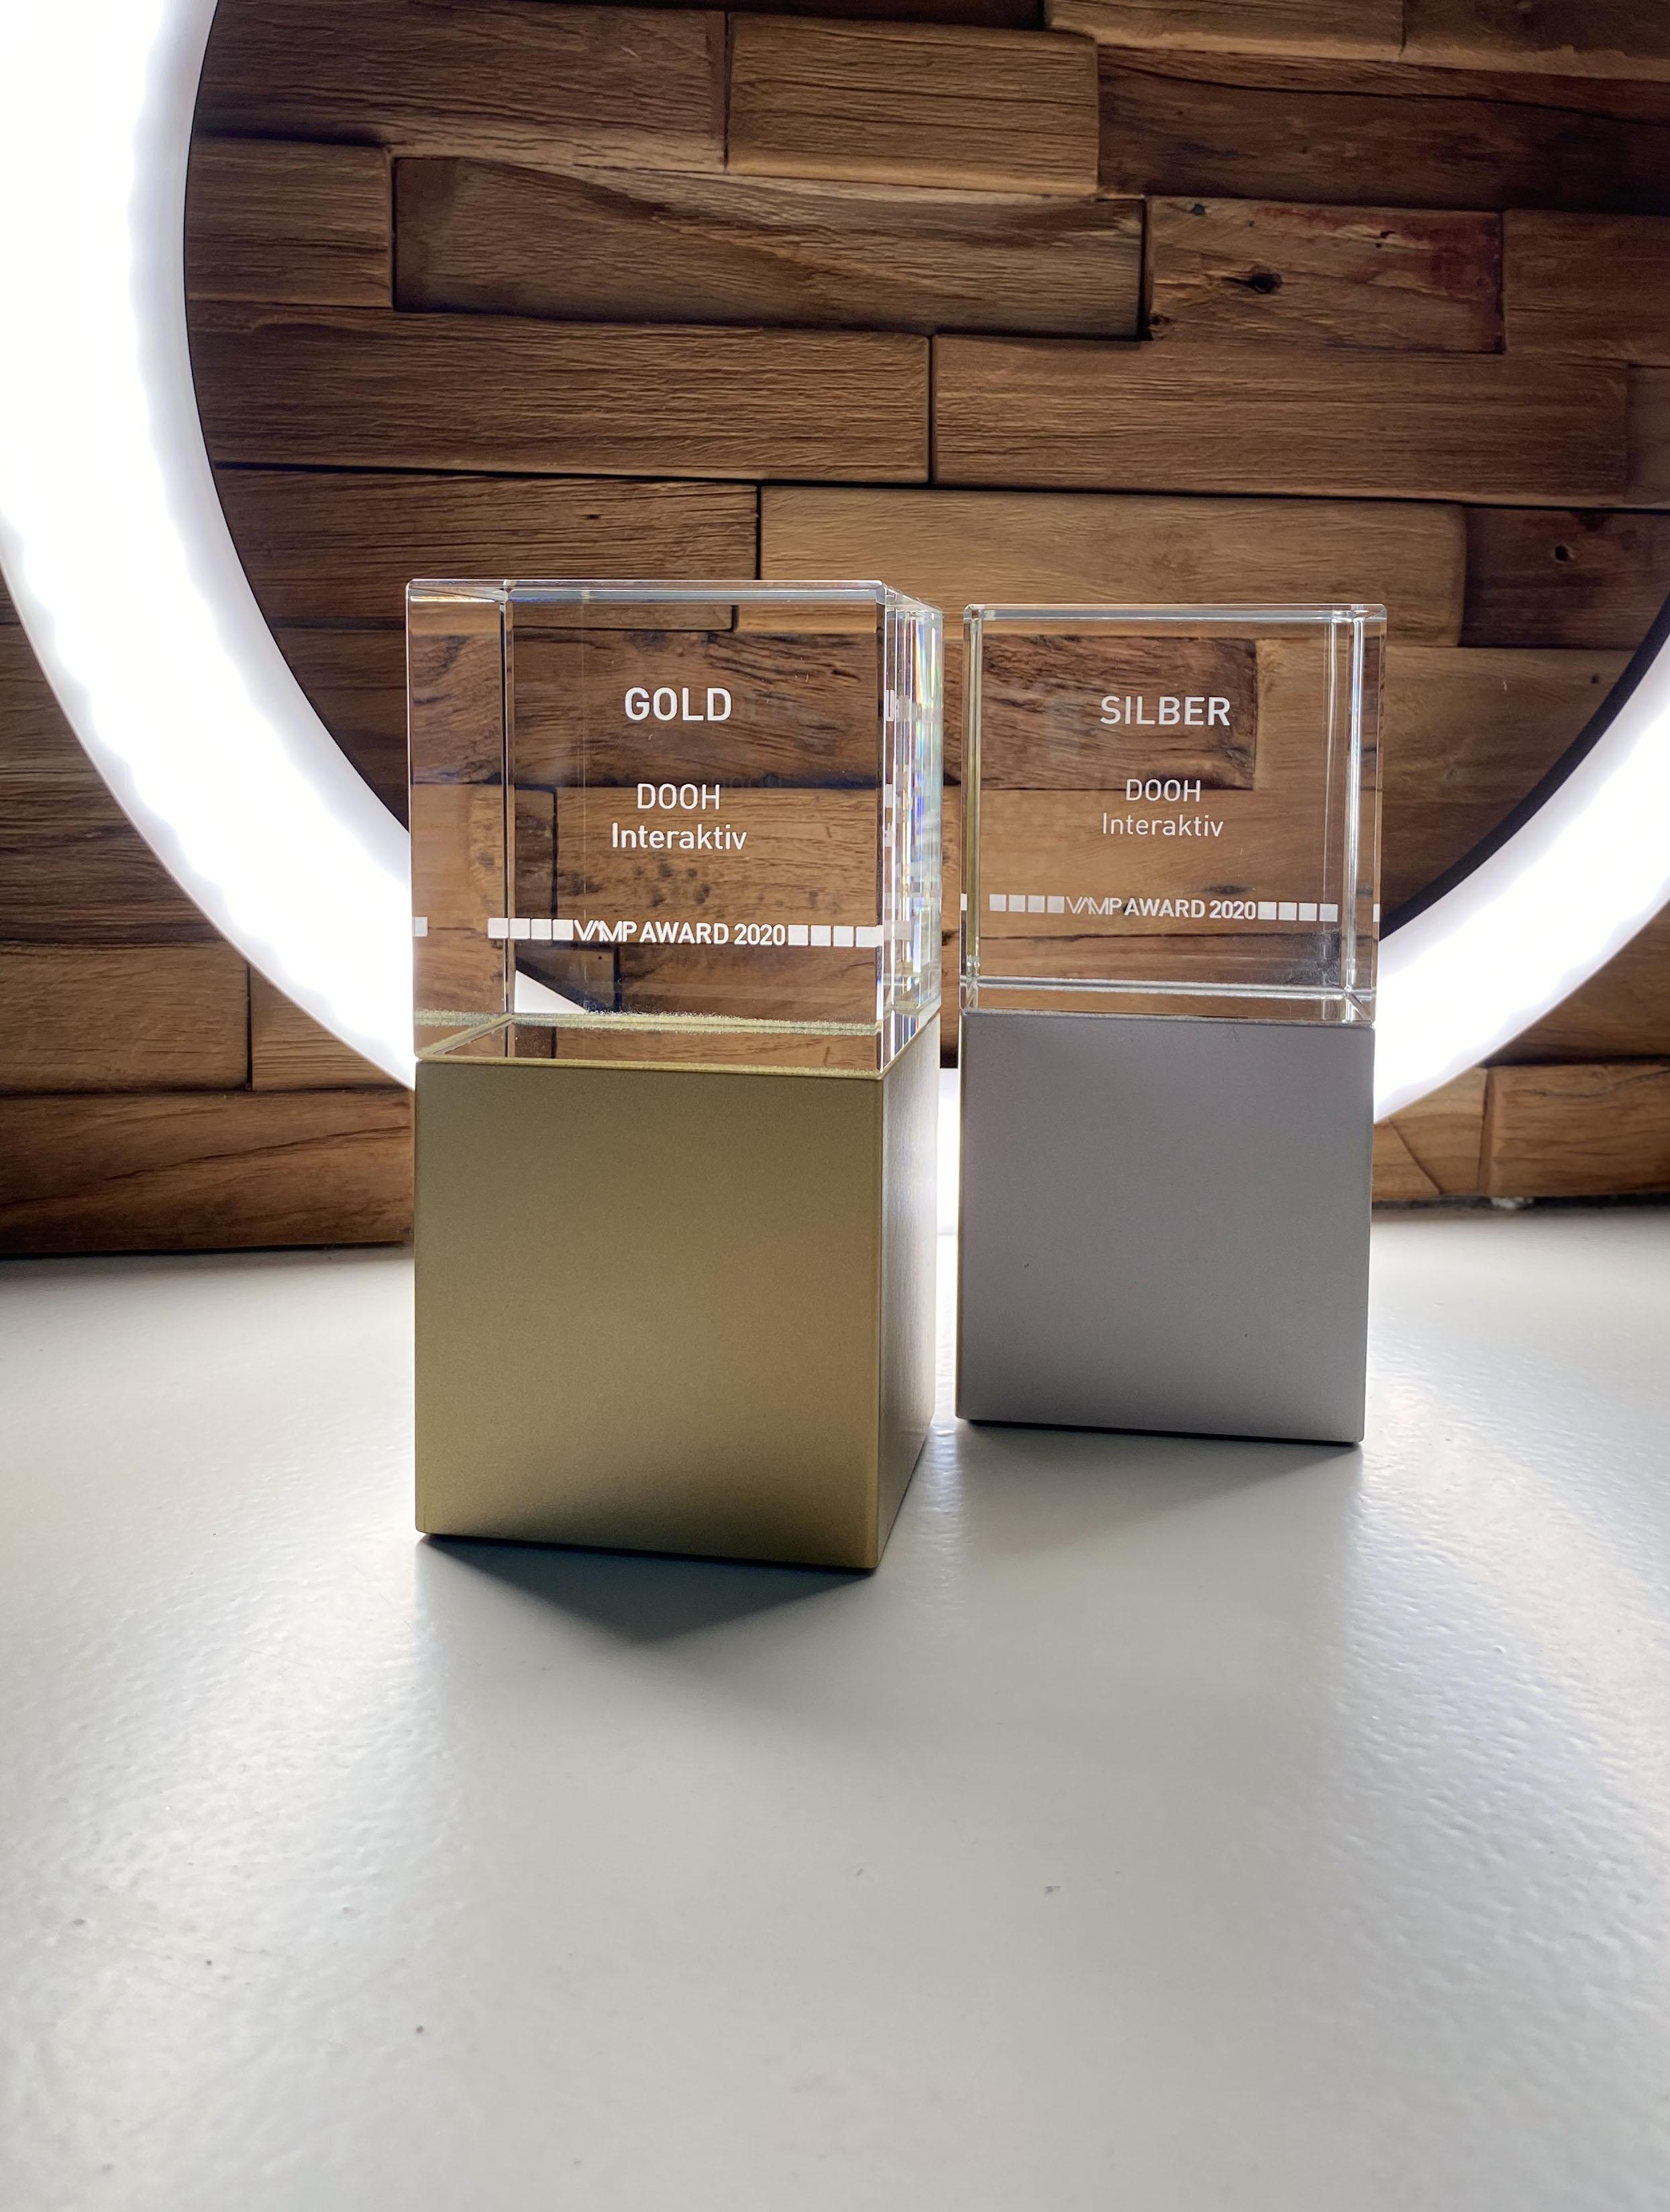 VAMP Award 2020